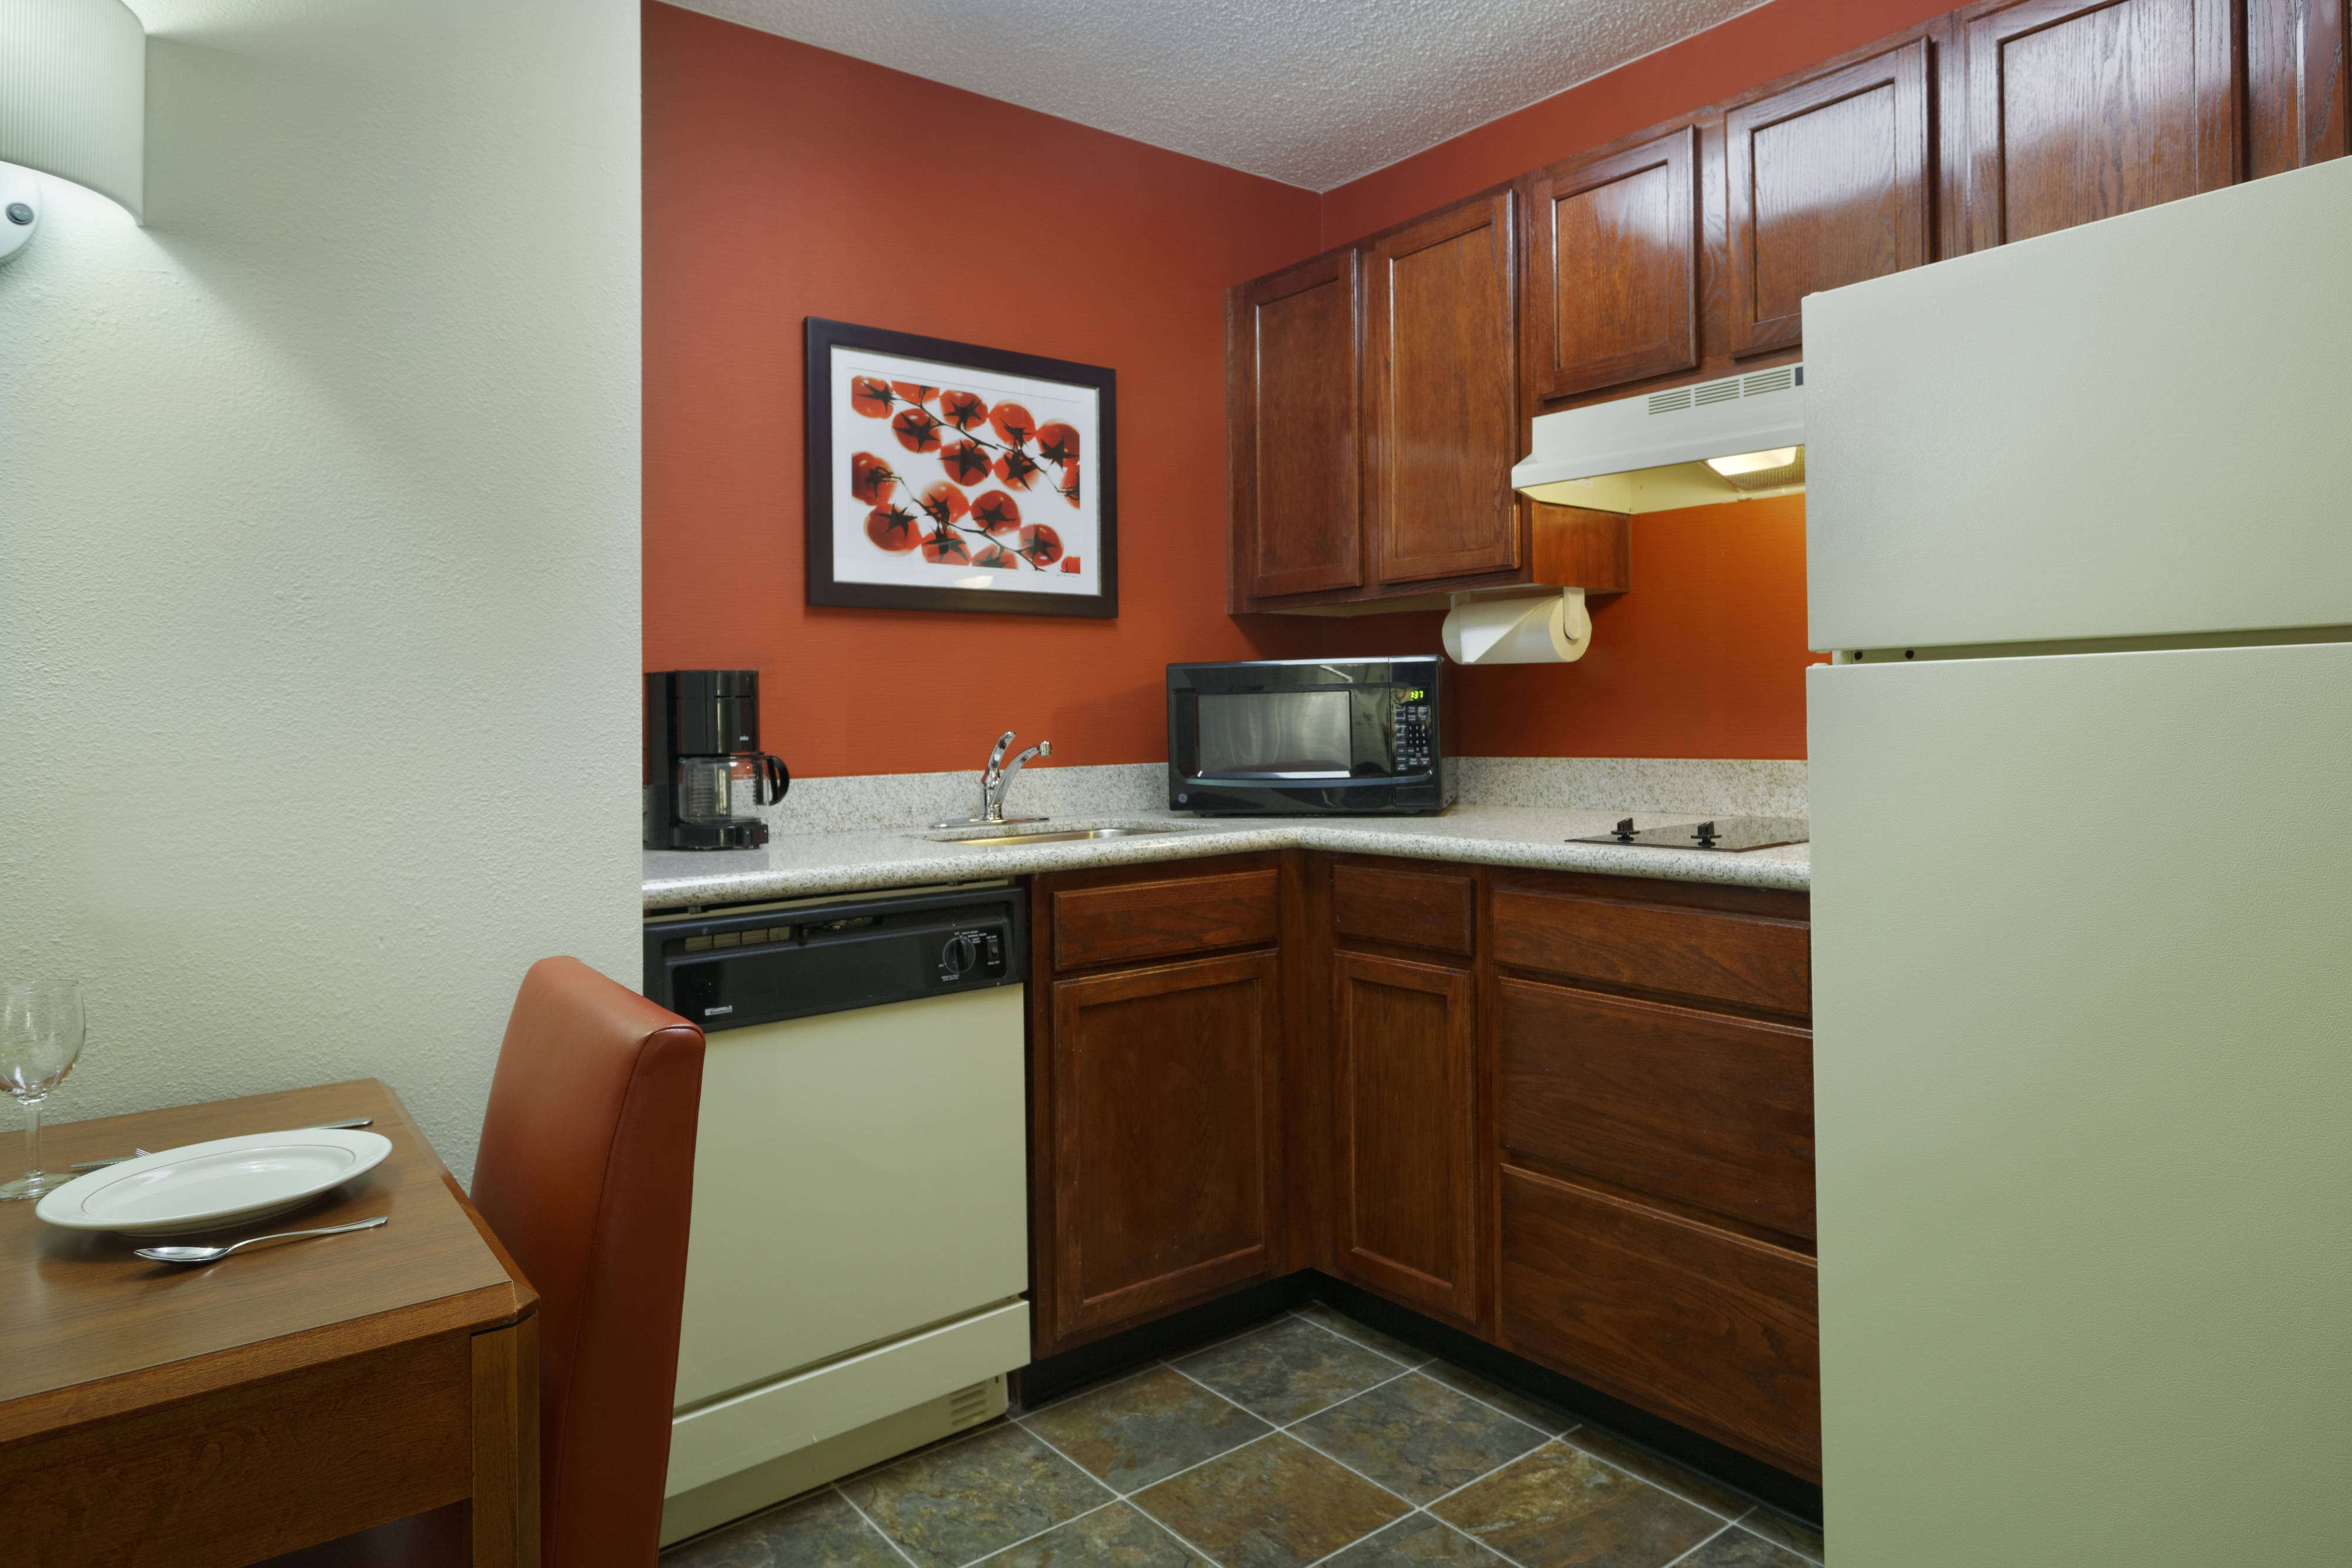 hotel room in greenville south carolina